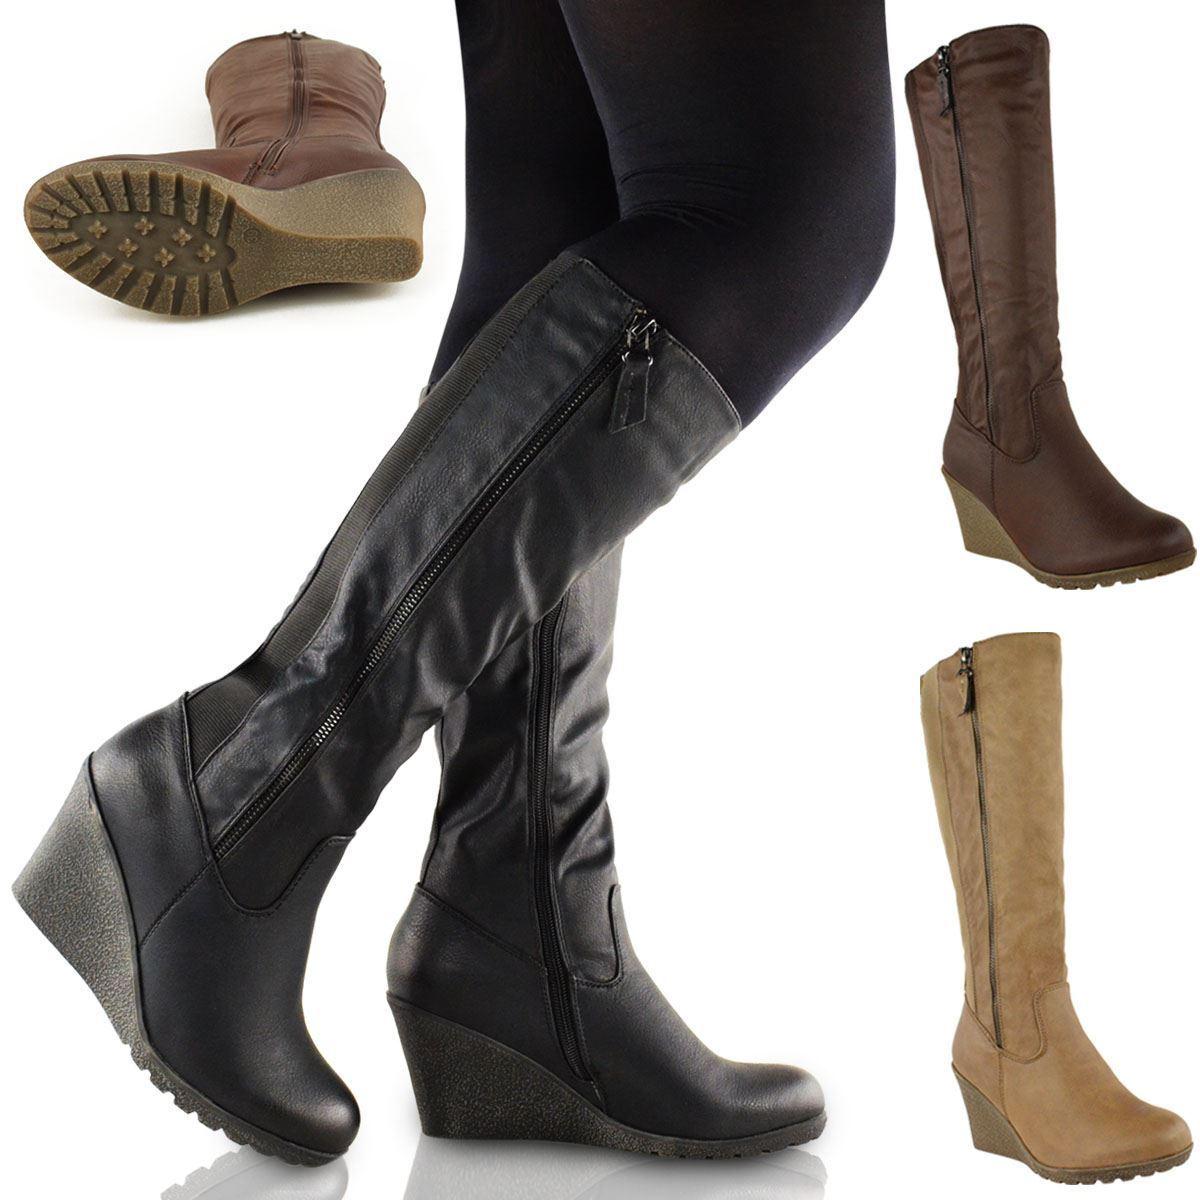 WOMENS LADIES WEDGE HEEL KNEE HIGH MID CALF WIDE LEG ELASTIC WINTER BIKER BOOTS